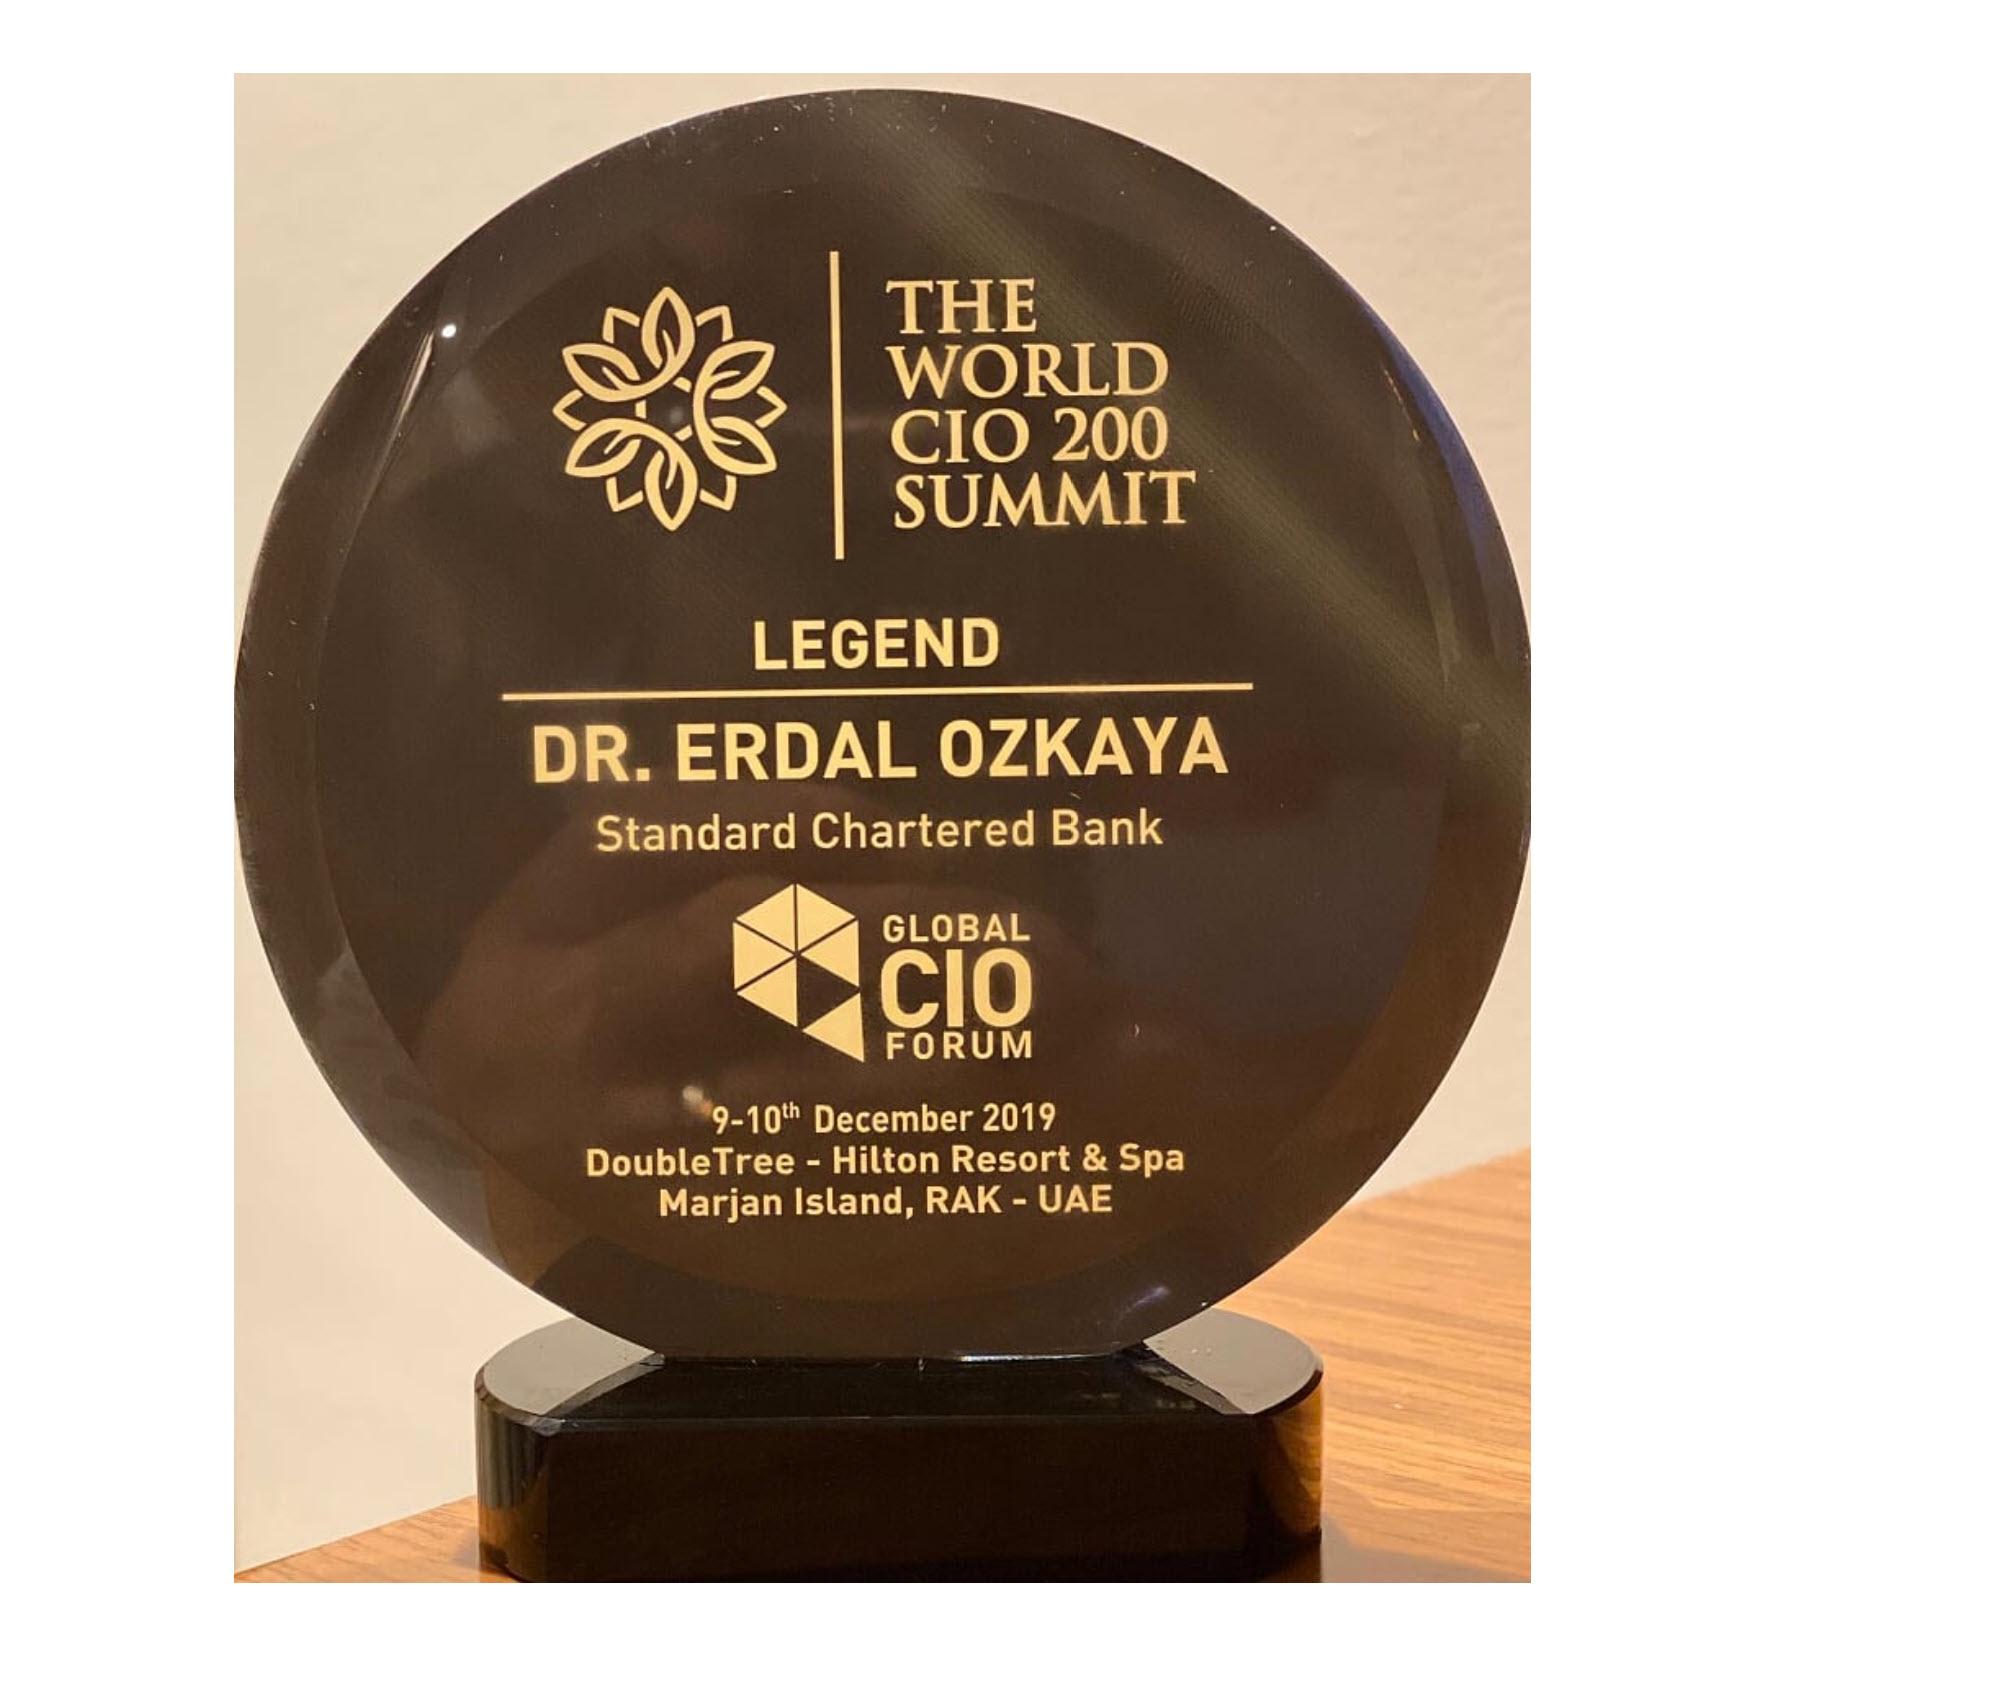 Cybersecurity Legend Dr Erdal Ozkaya